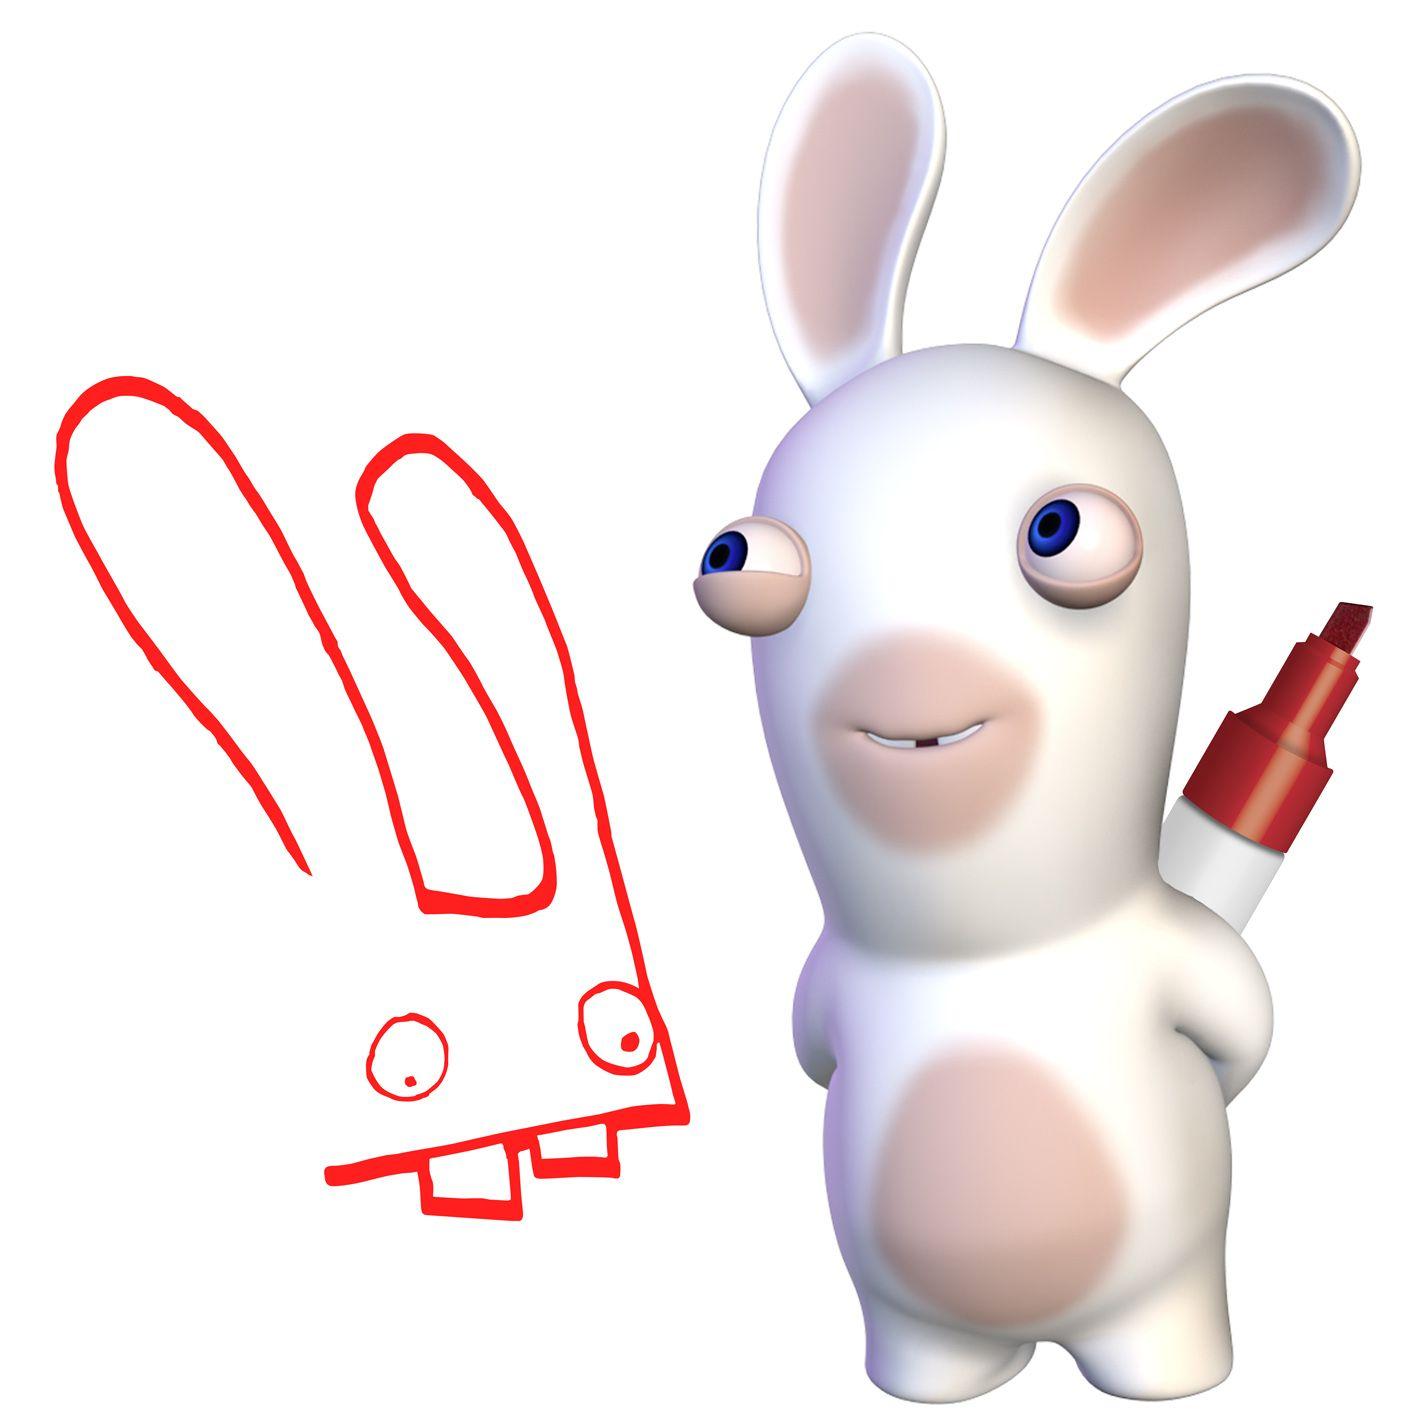 Photos lapins cretins - Lapin cretin image ...